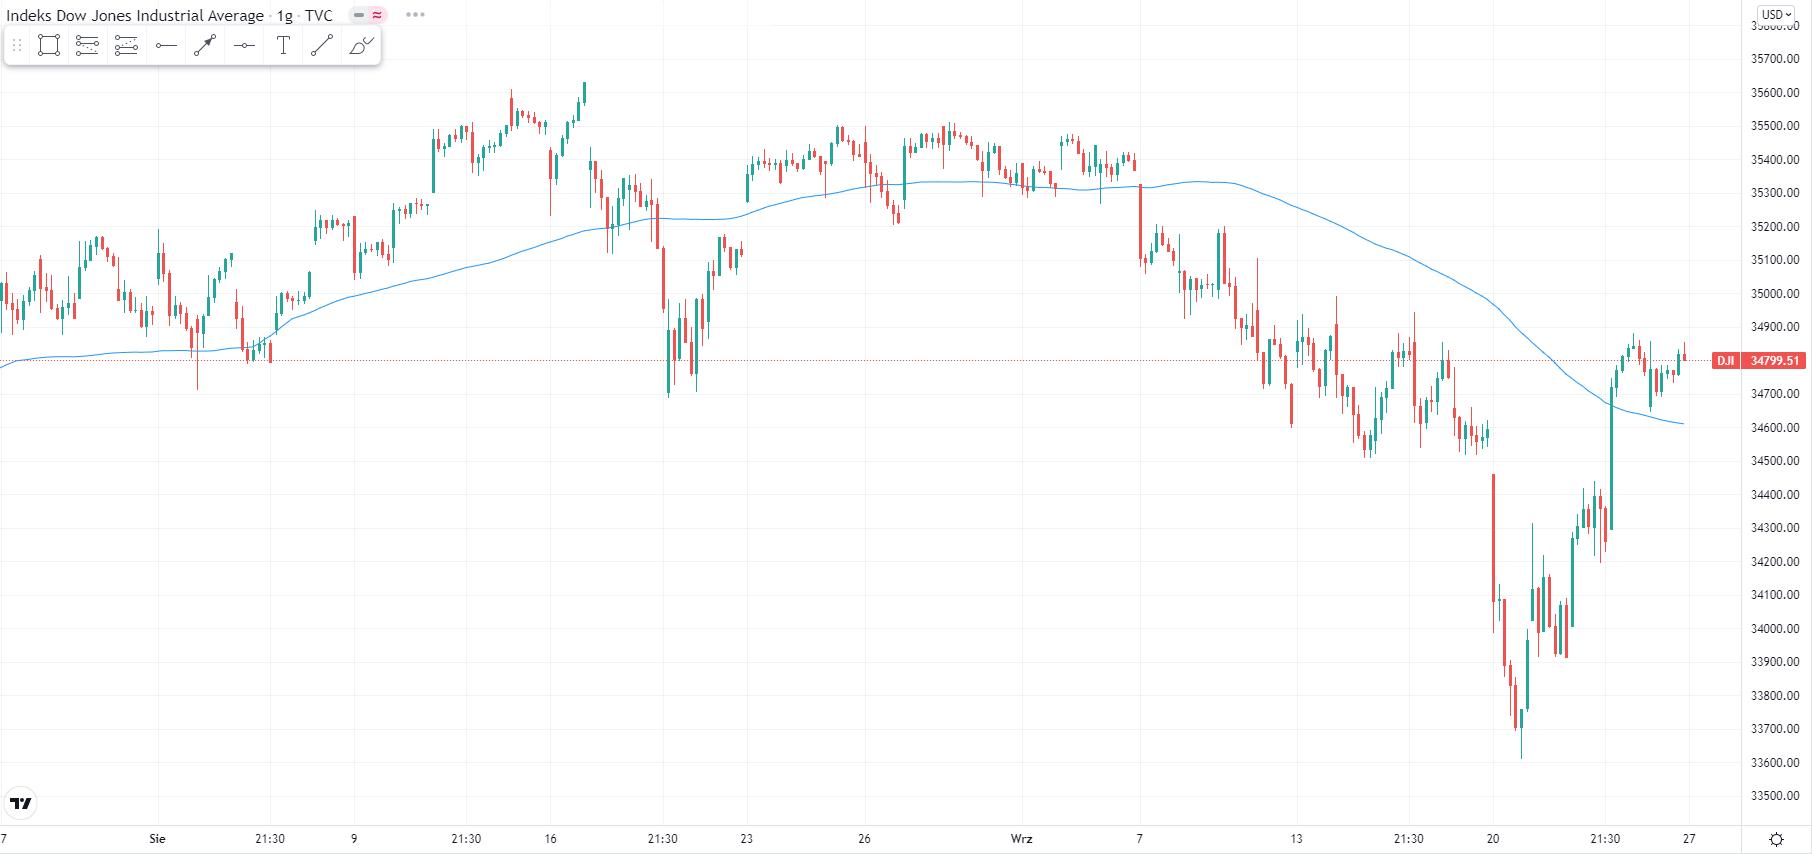 wykres Kurs indeksu Dow Jones H1 27.09.2021